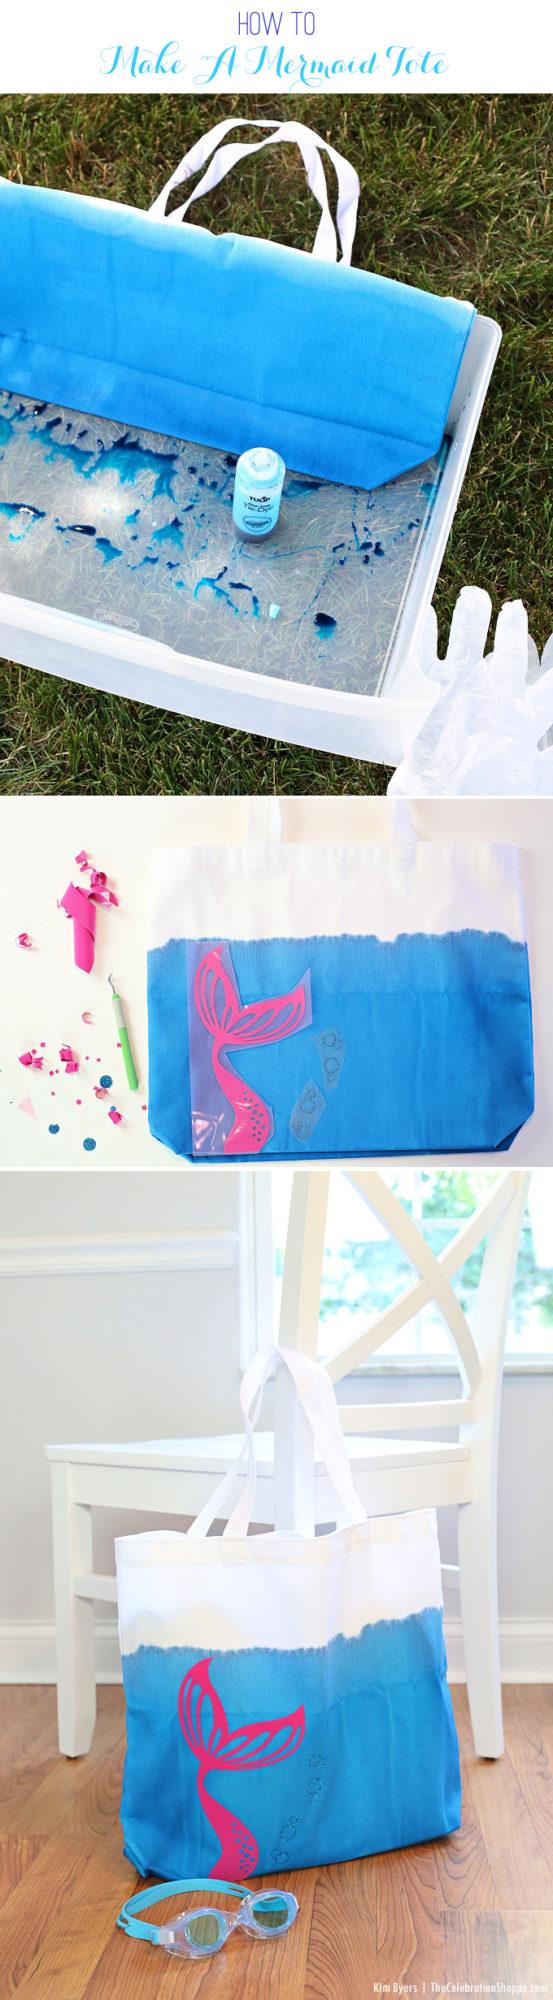 How To Make A Mermaid Tote | Kim Byers